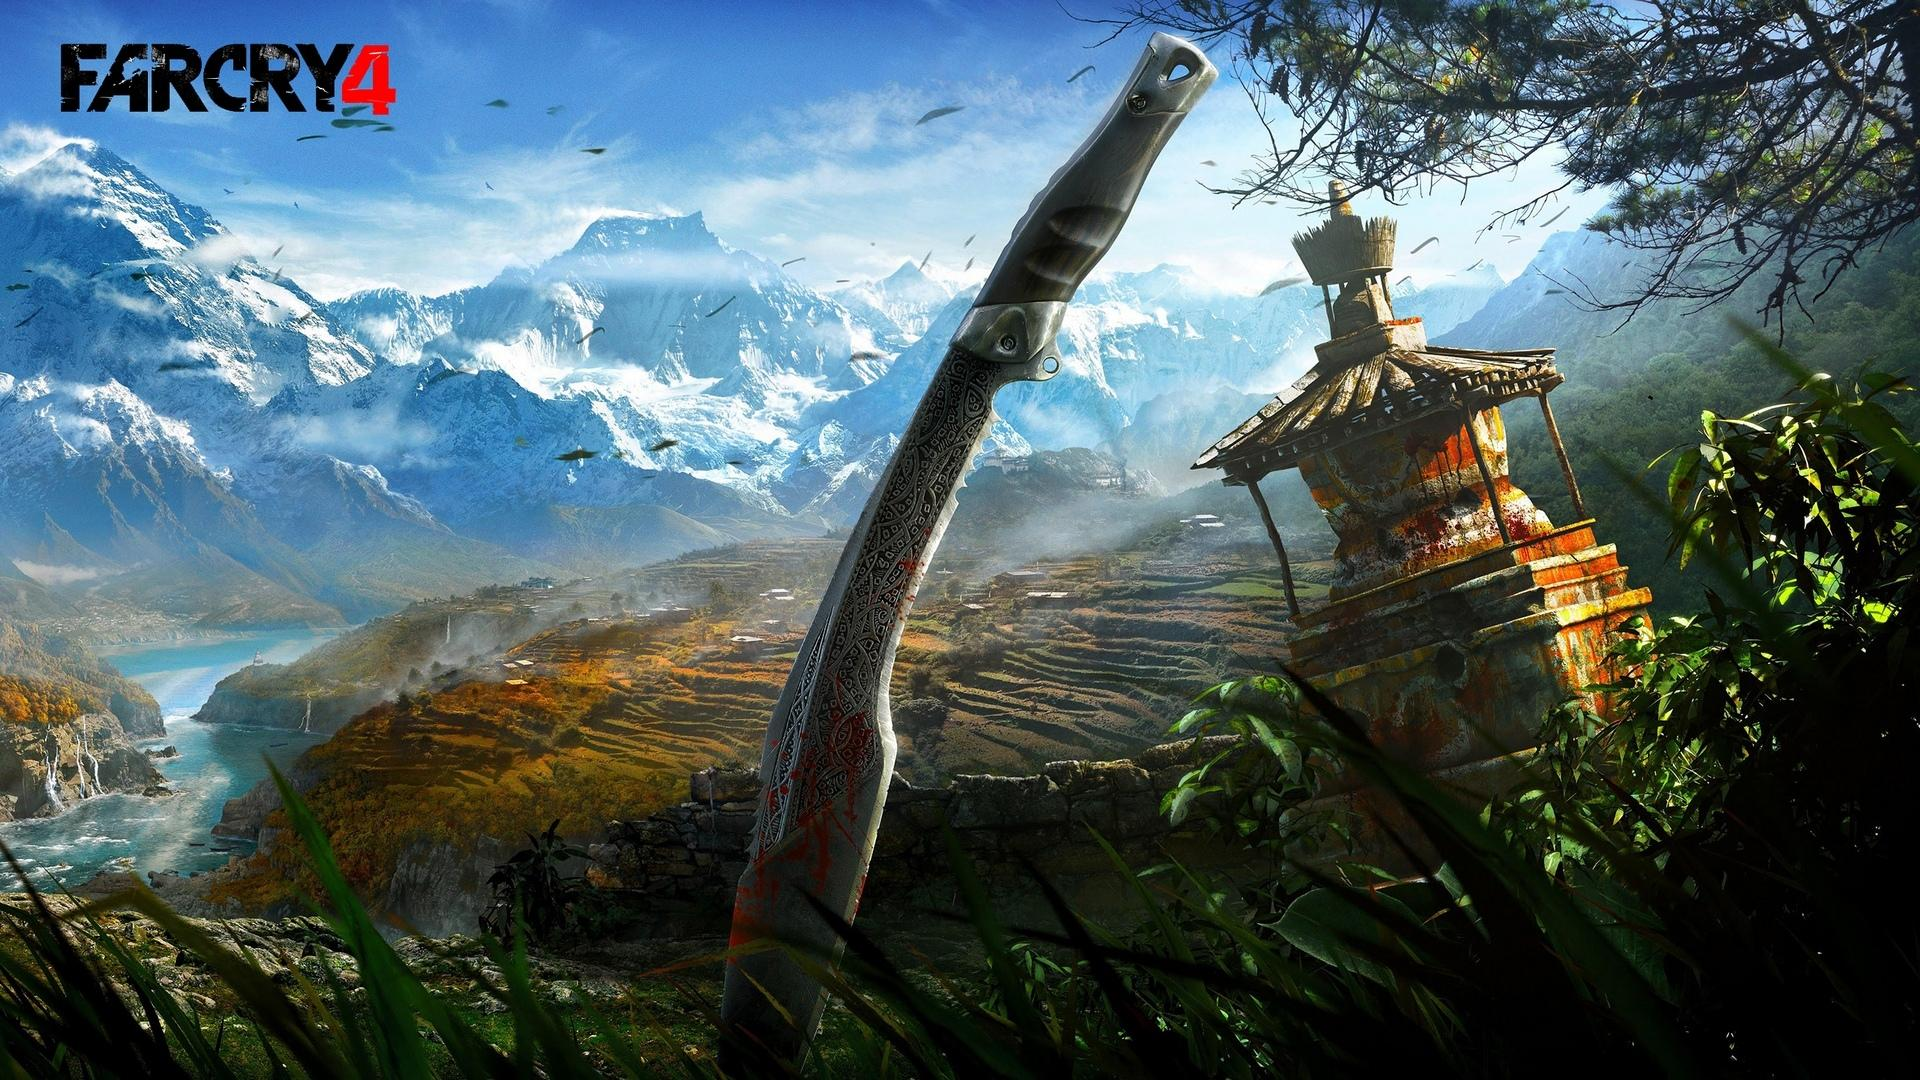 Far cry 4 wallpaper hd download - Far cry 4 wallpaper ...